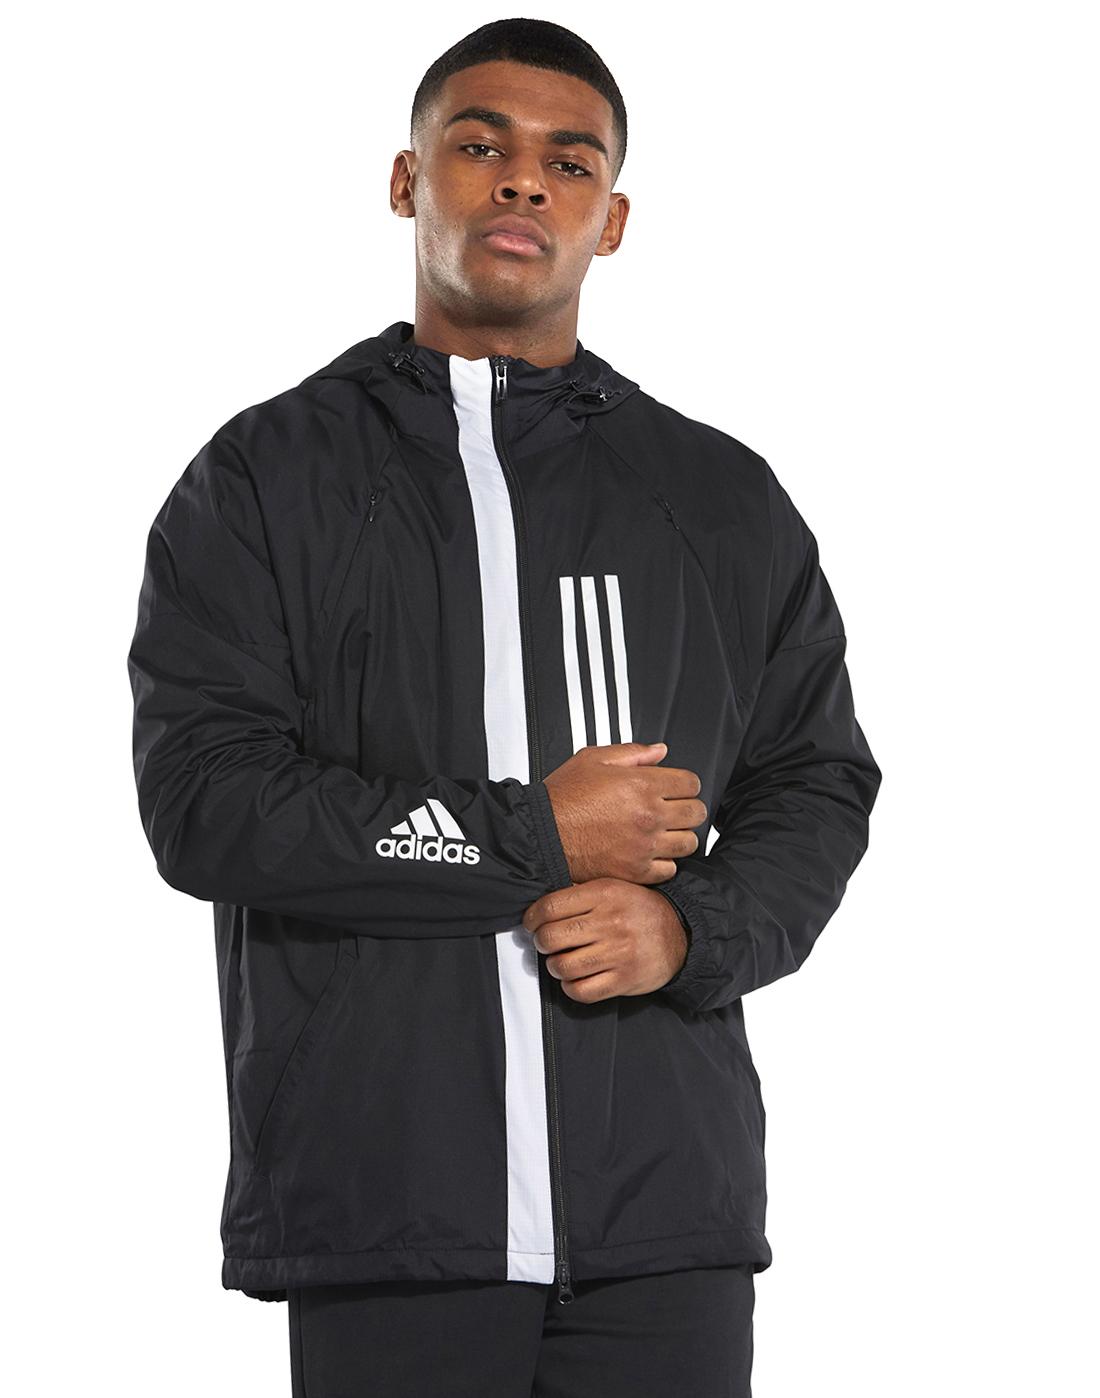 Virus brecha informal  Men's Black adidas WND Jacket | Life Style Sports